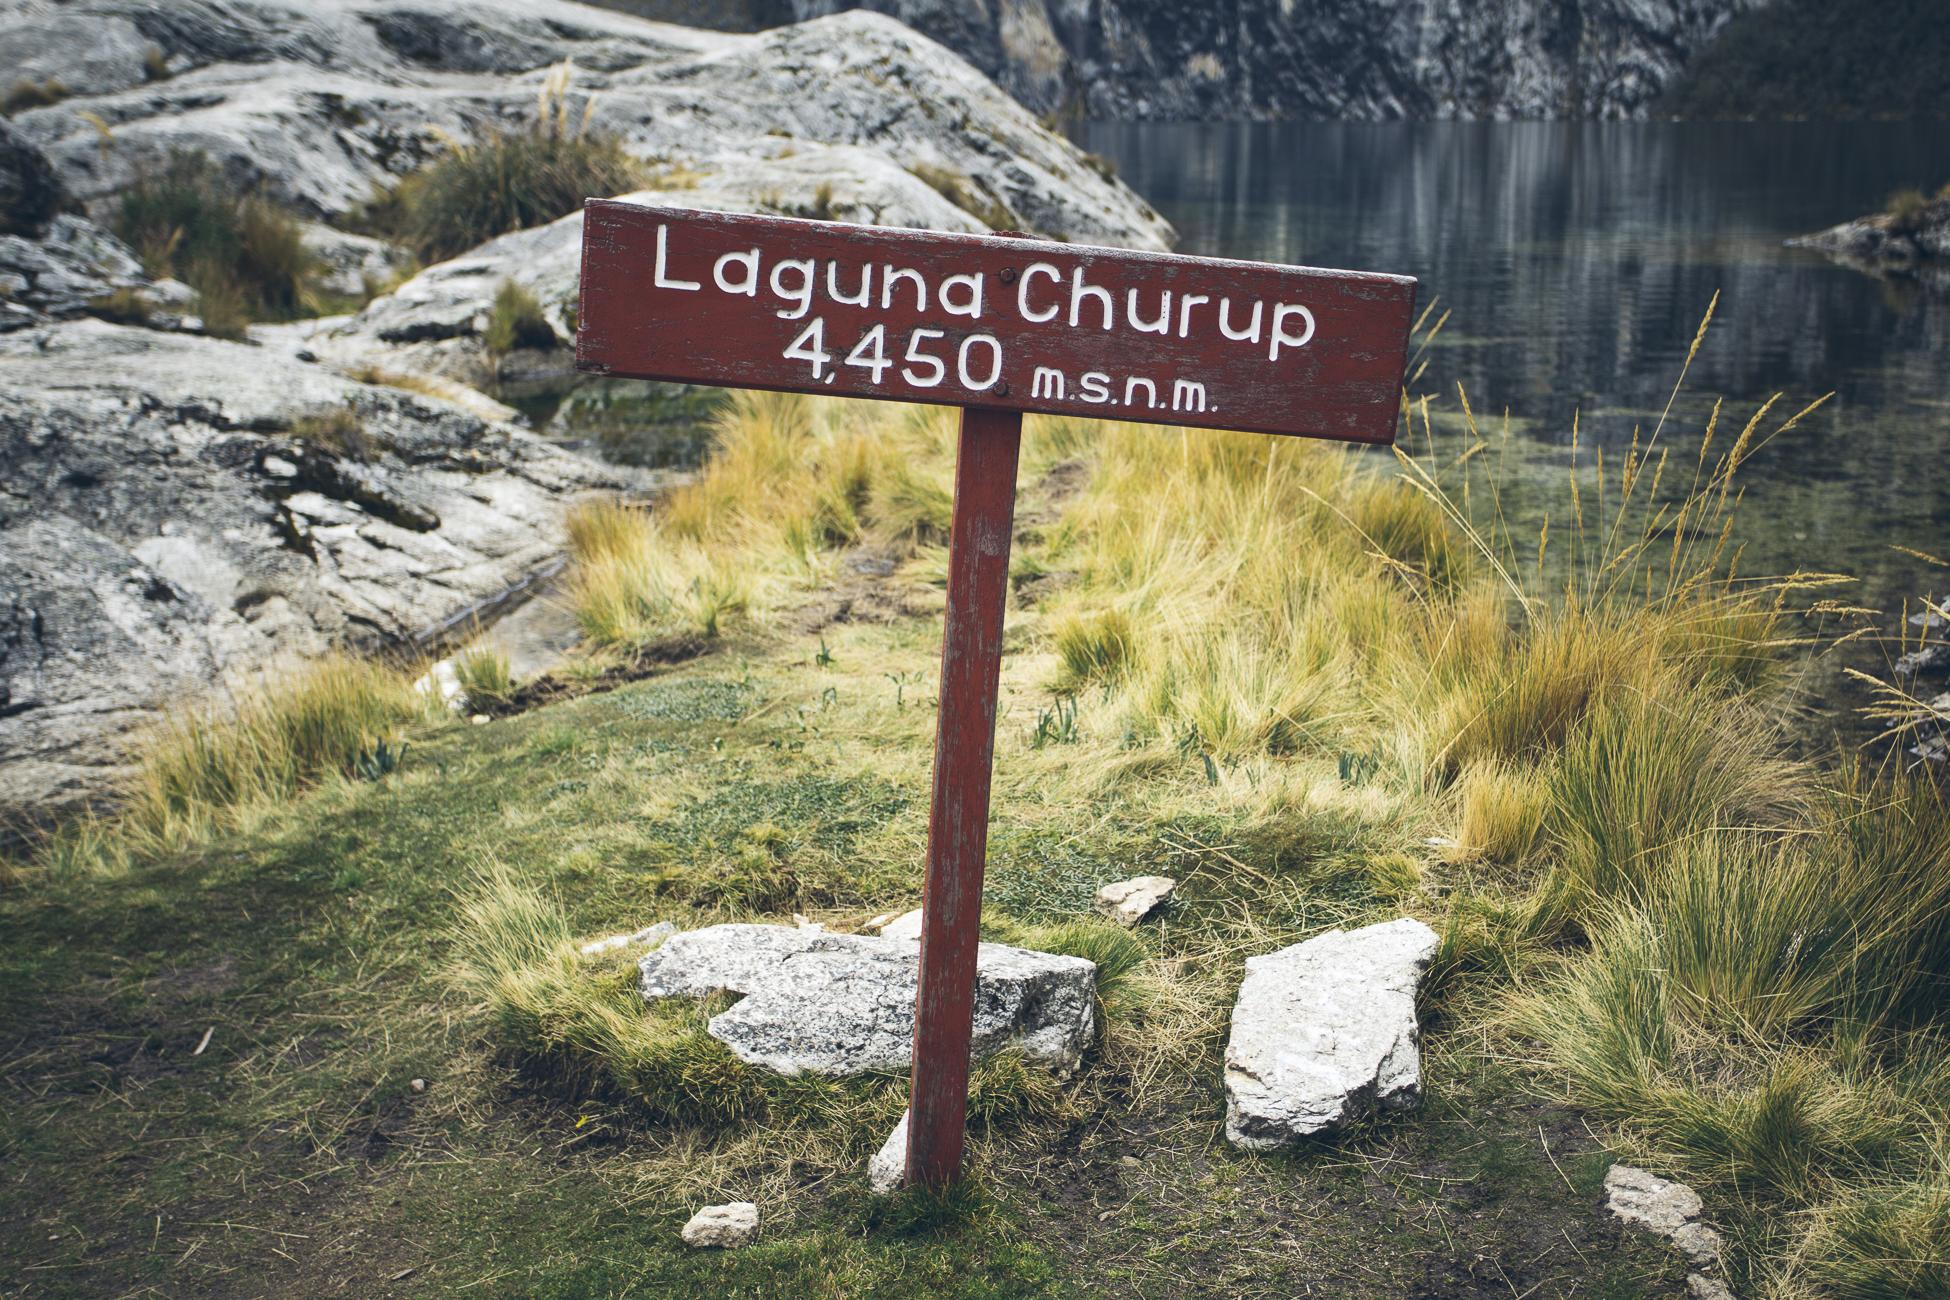 desktoglory_laguna_churup-1c